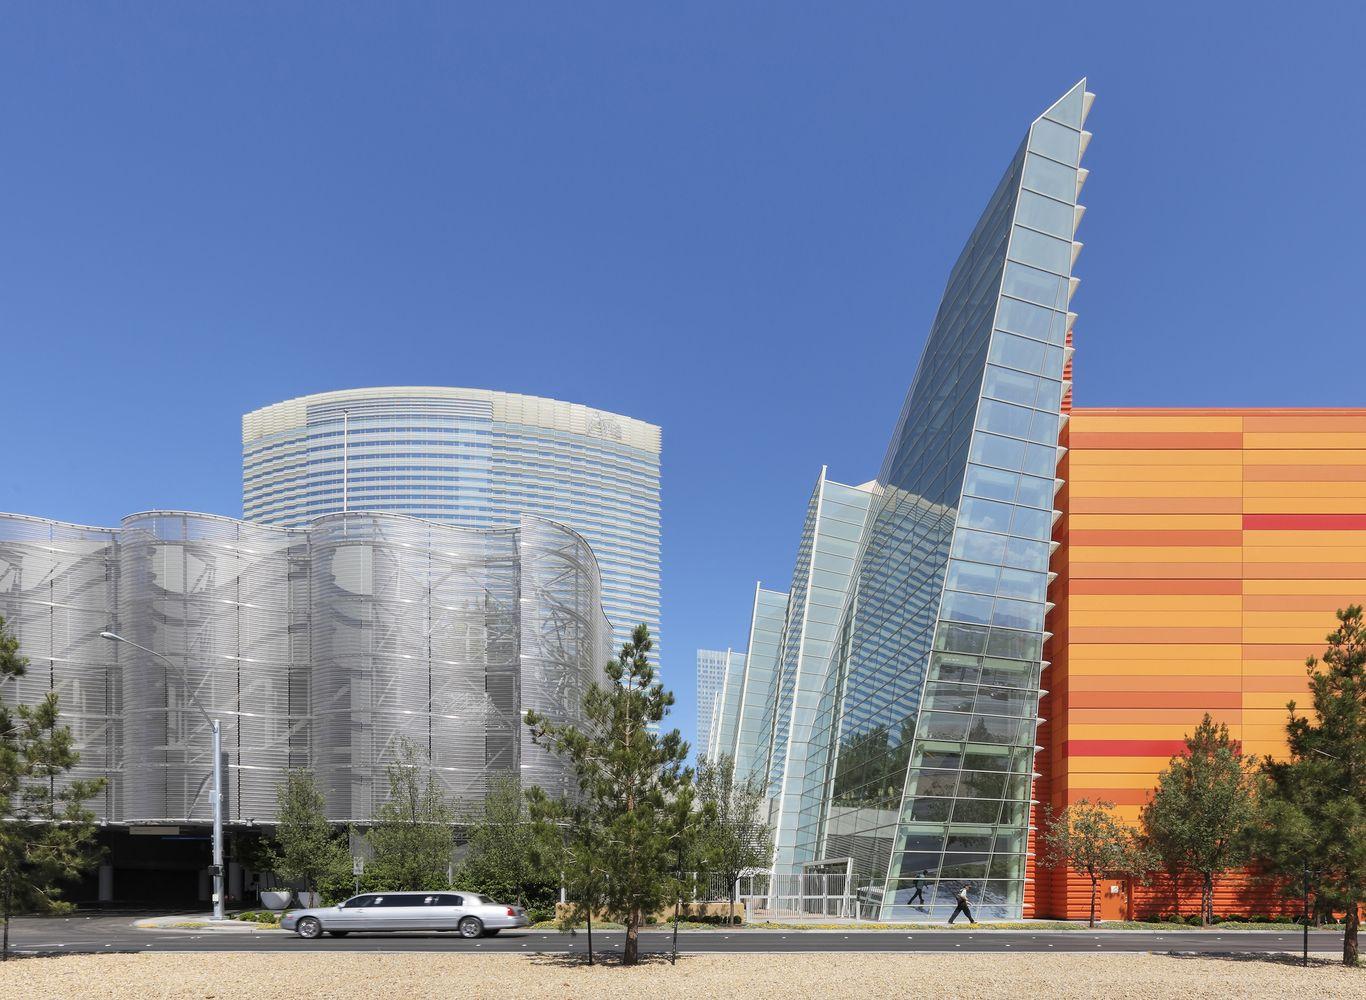 Gallery Of Aria Resort And Casino Pelli Clarke Pelli Architects